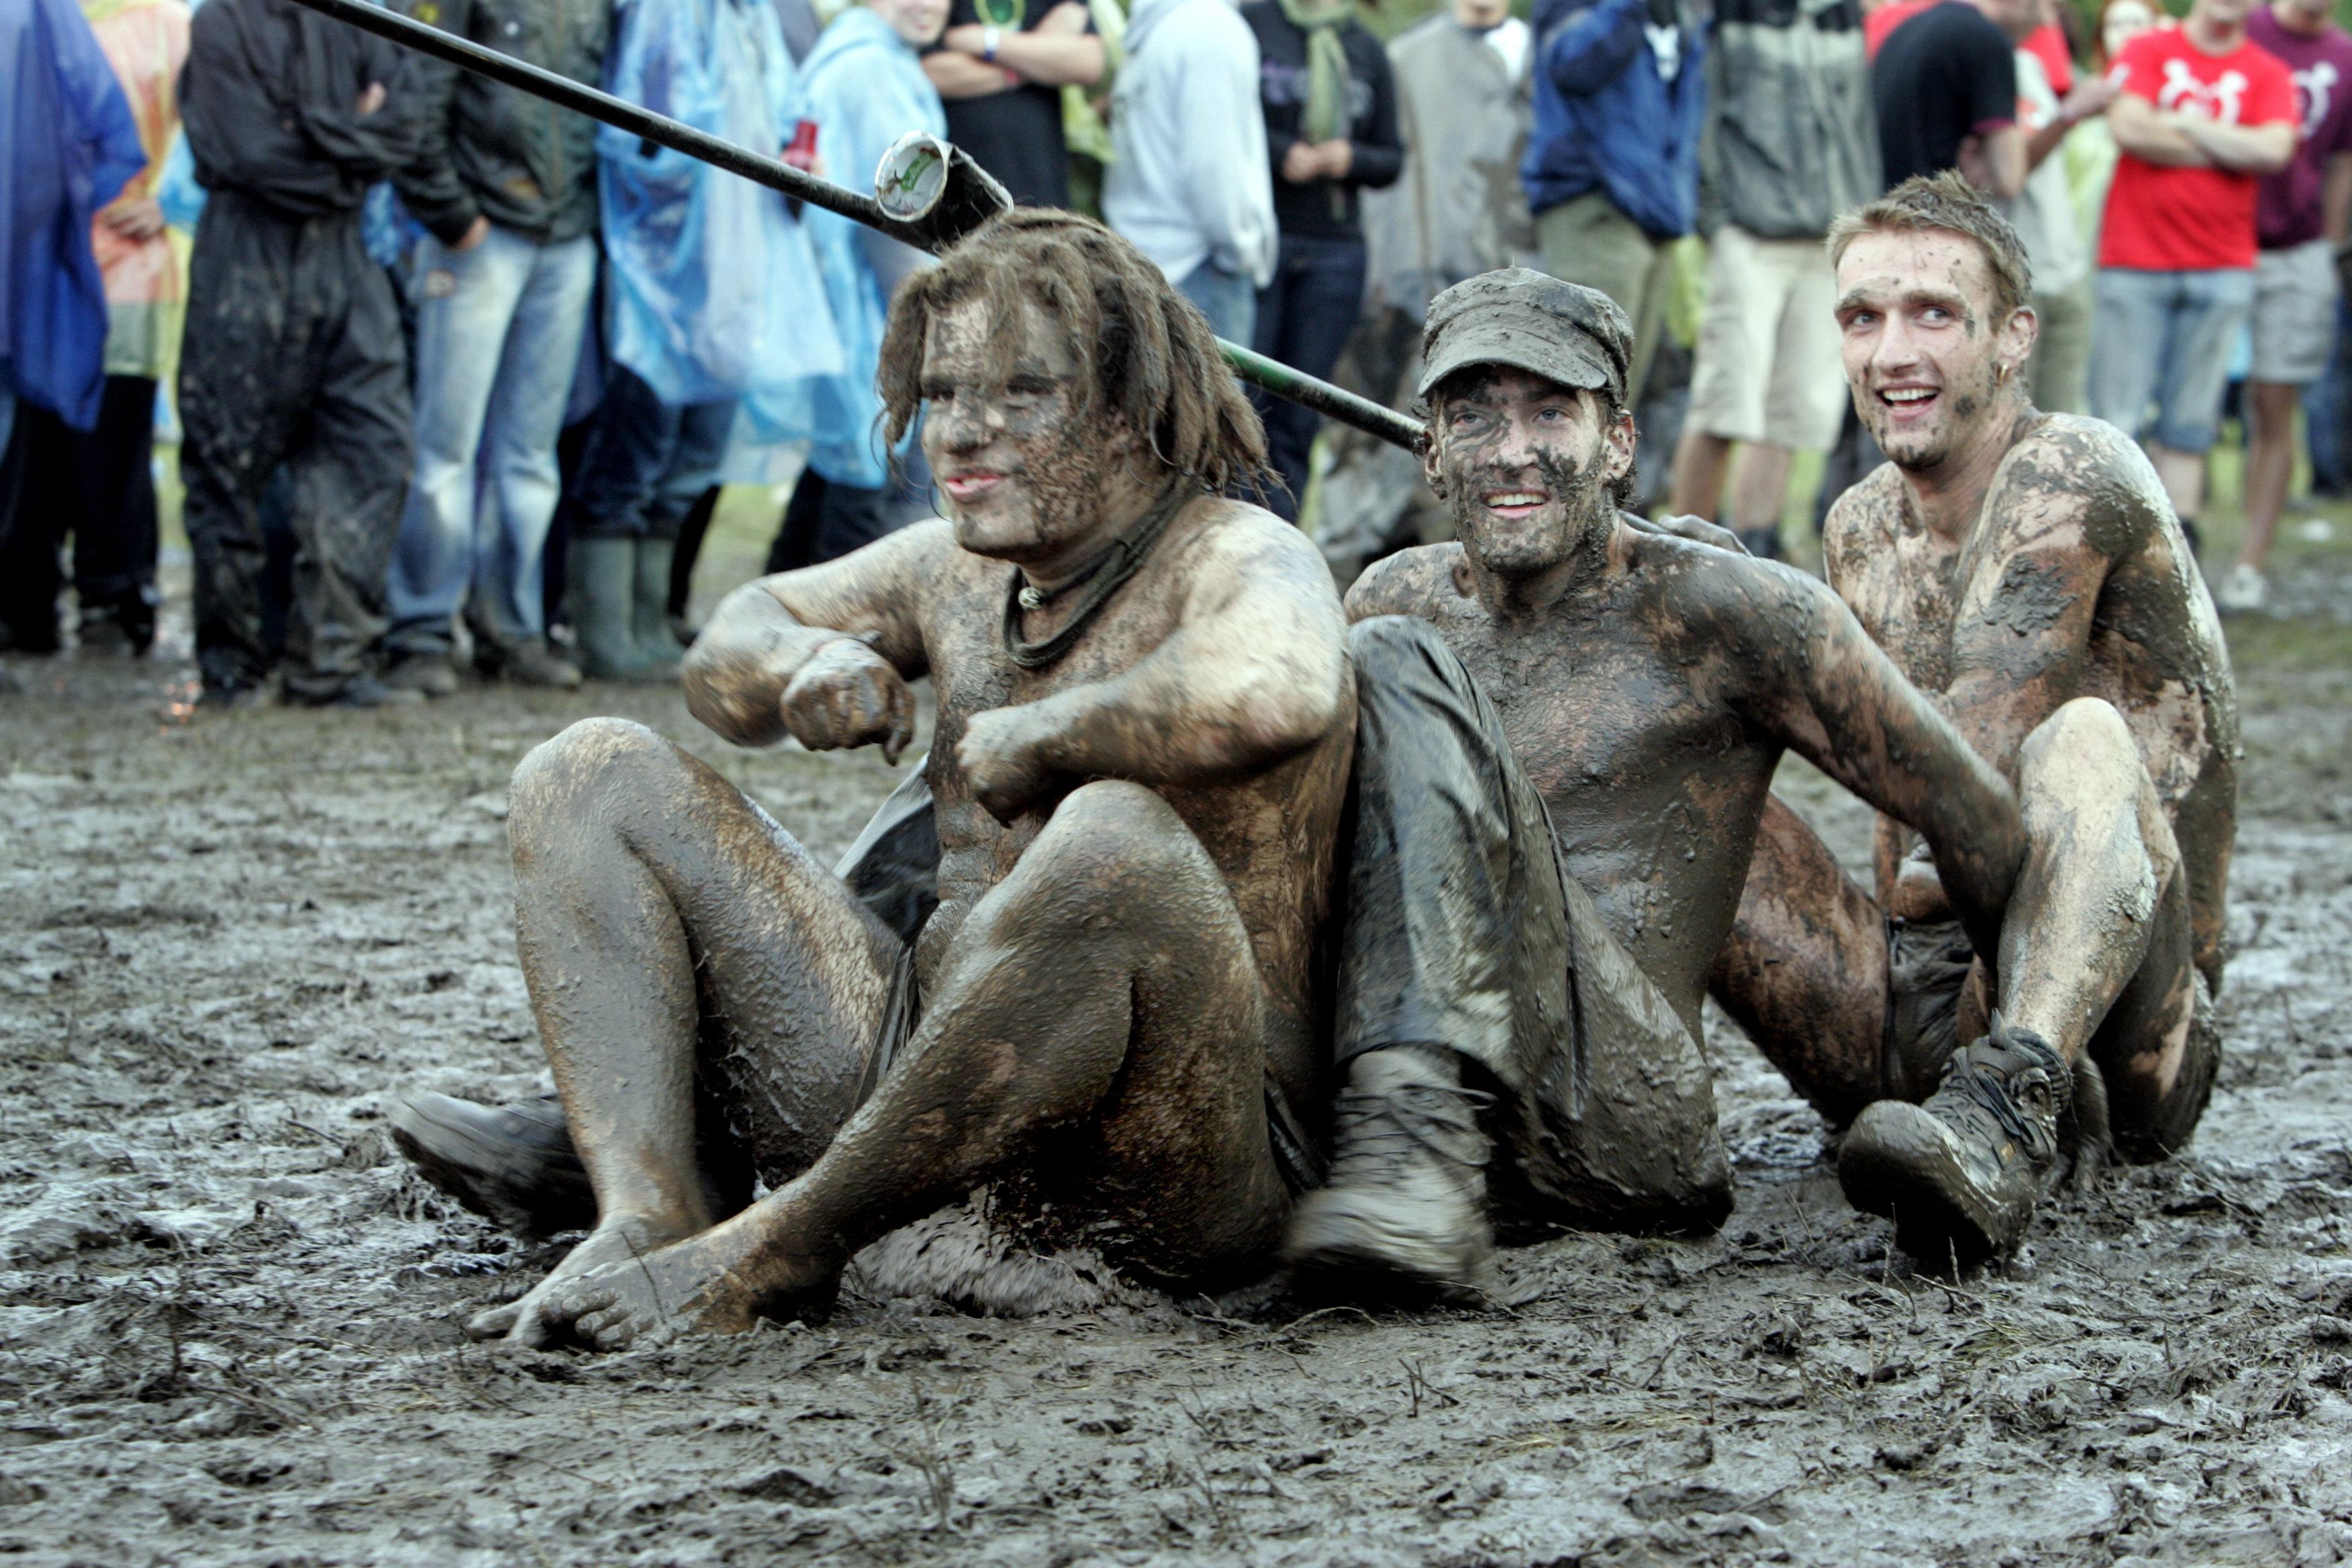 Modderige taferelen bij Lowlands 2006